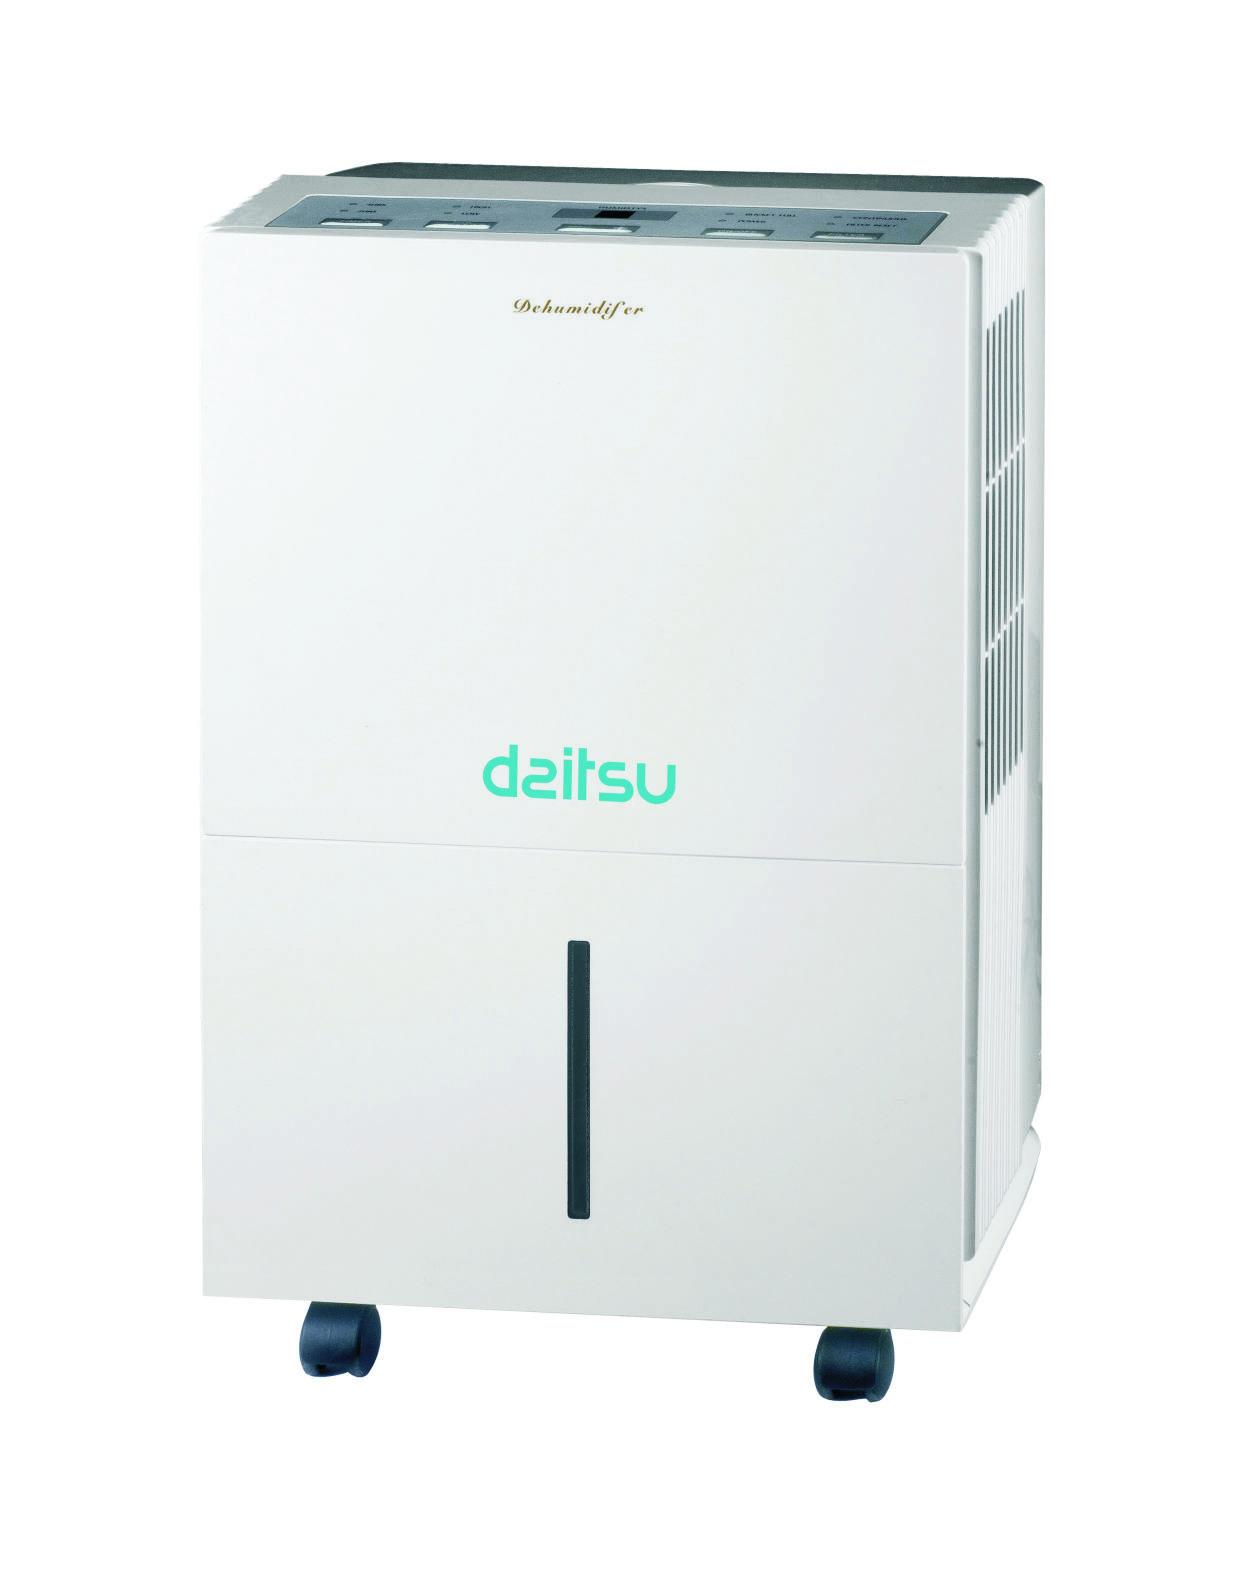 Odvlhčovač vzduchu Daitsu ADDH 20